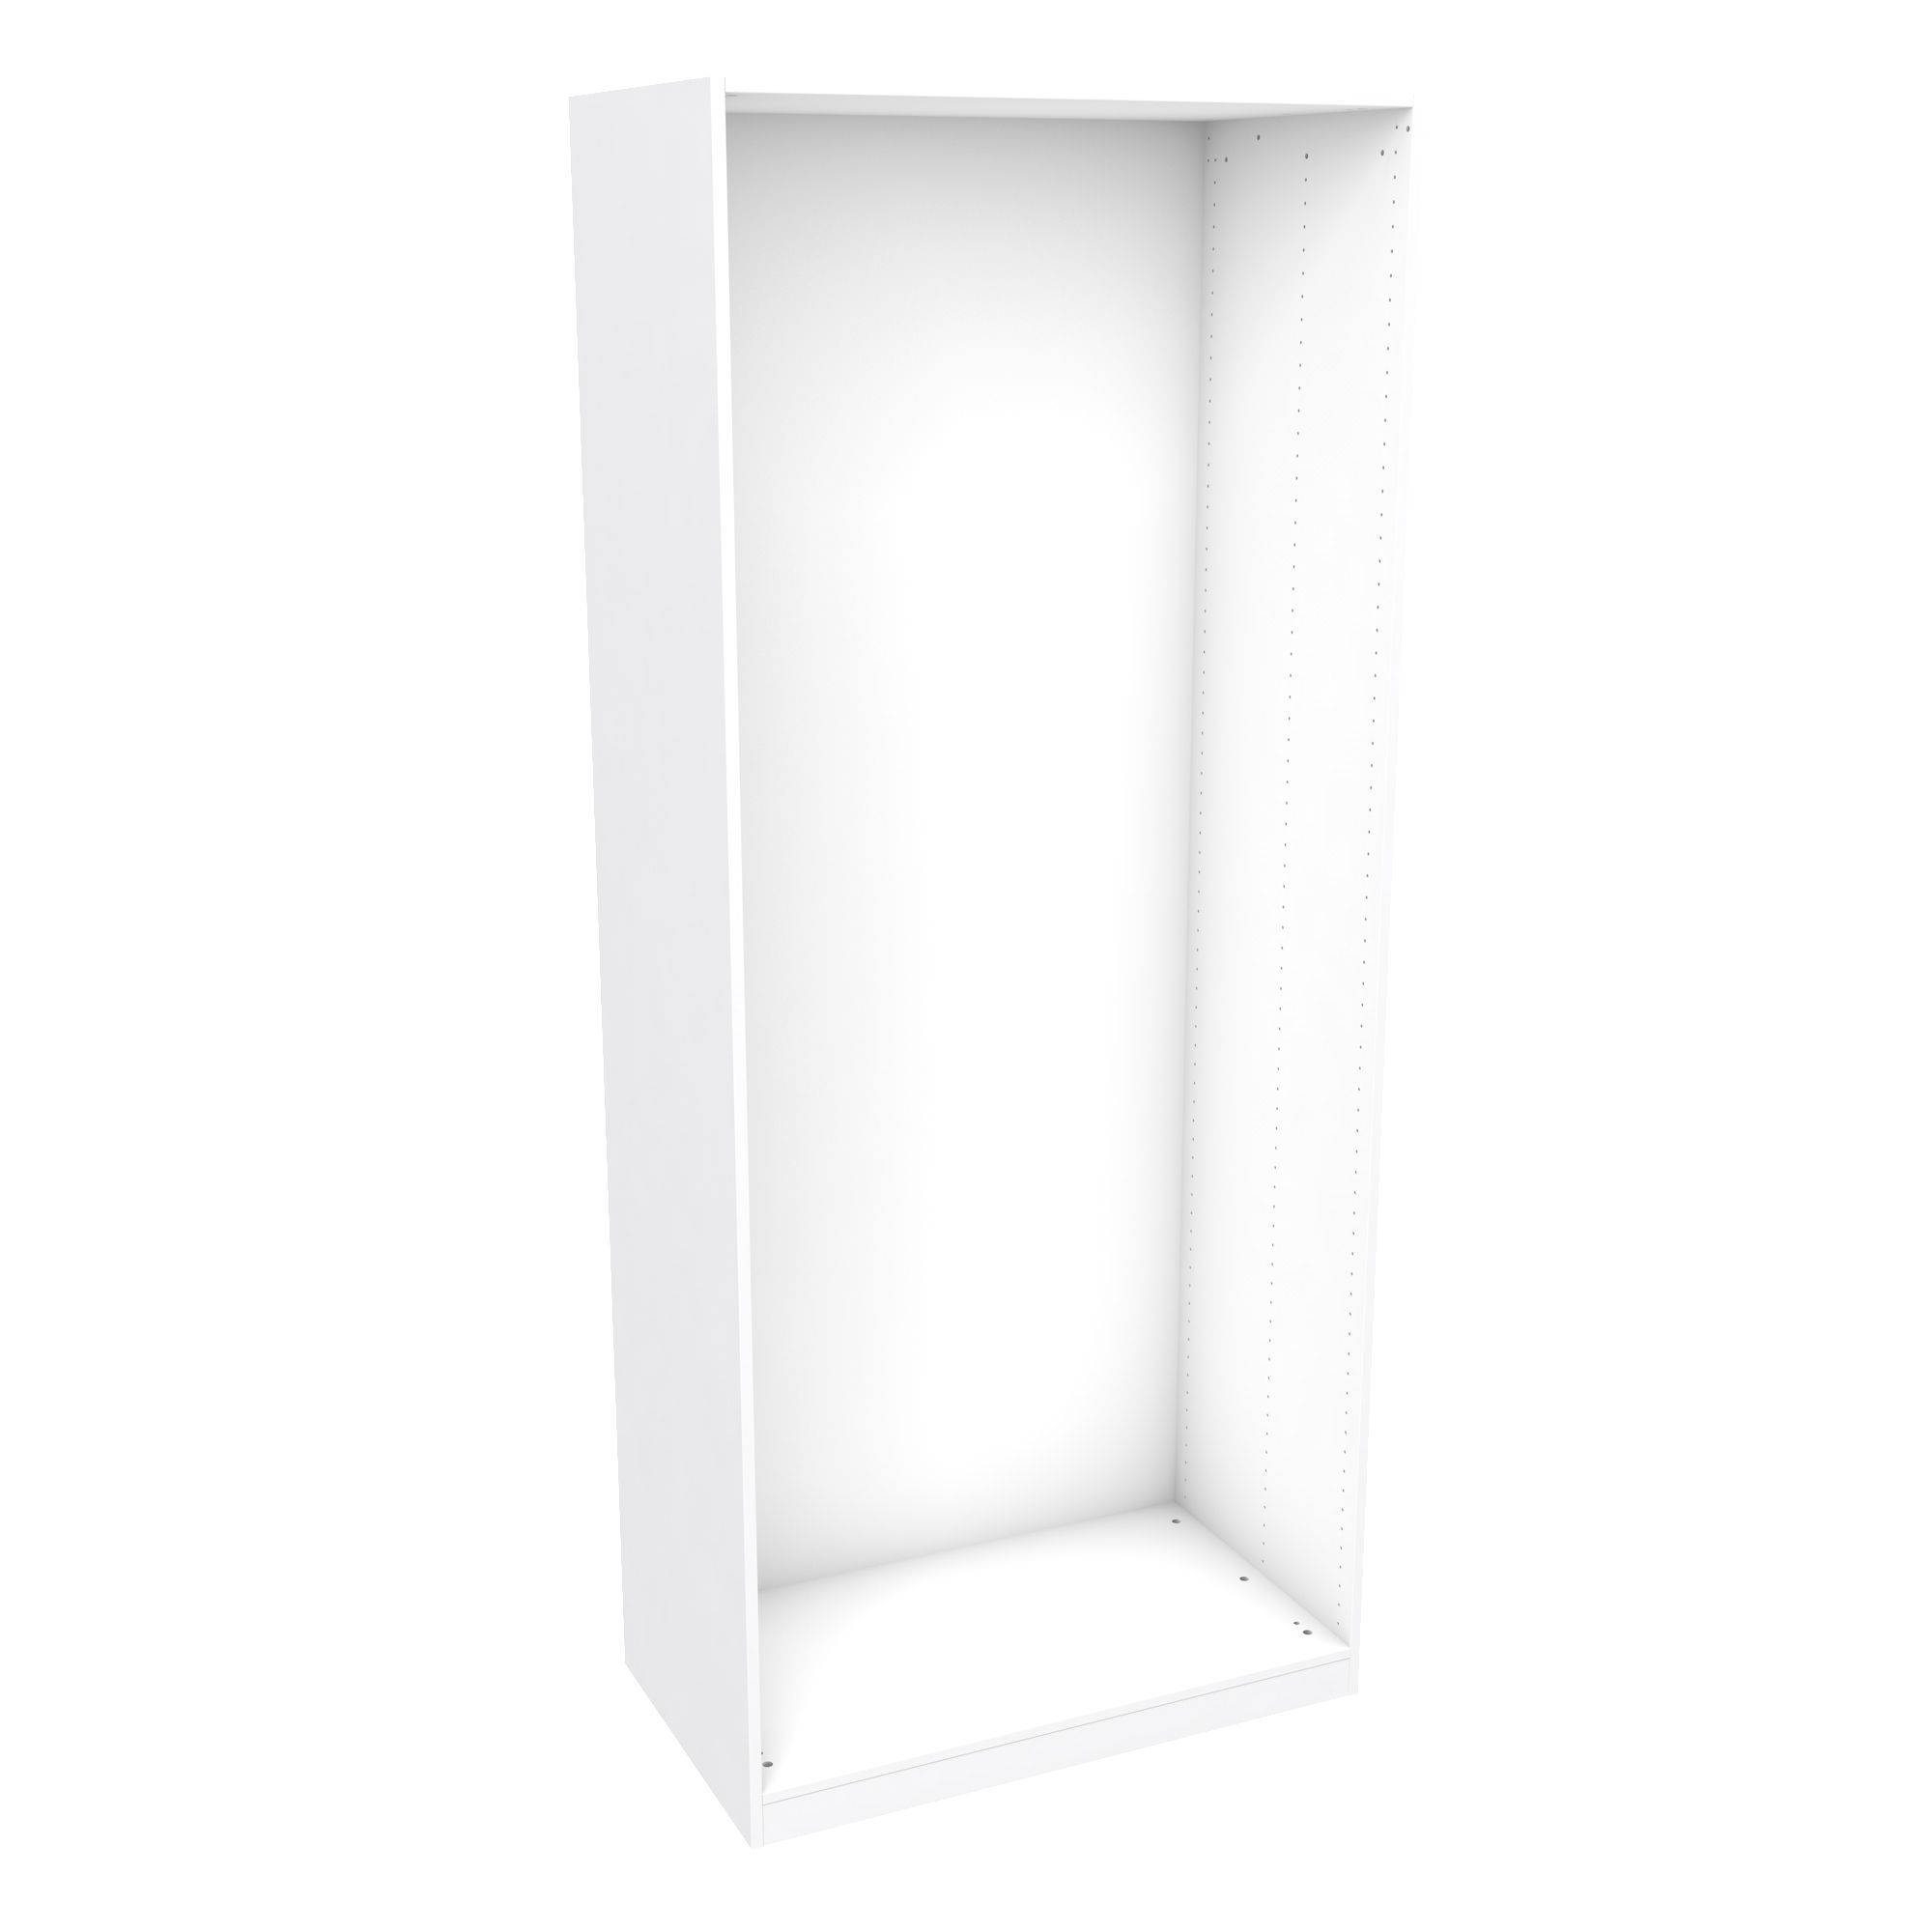 Darwin Modular White Tall Wardrobe Cabinet (h)2356mm (w)1000mm (d)566mm